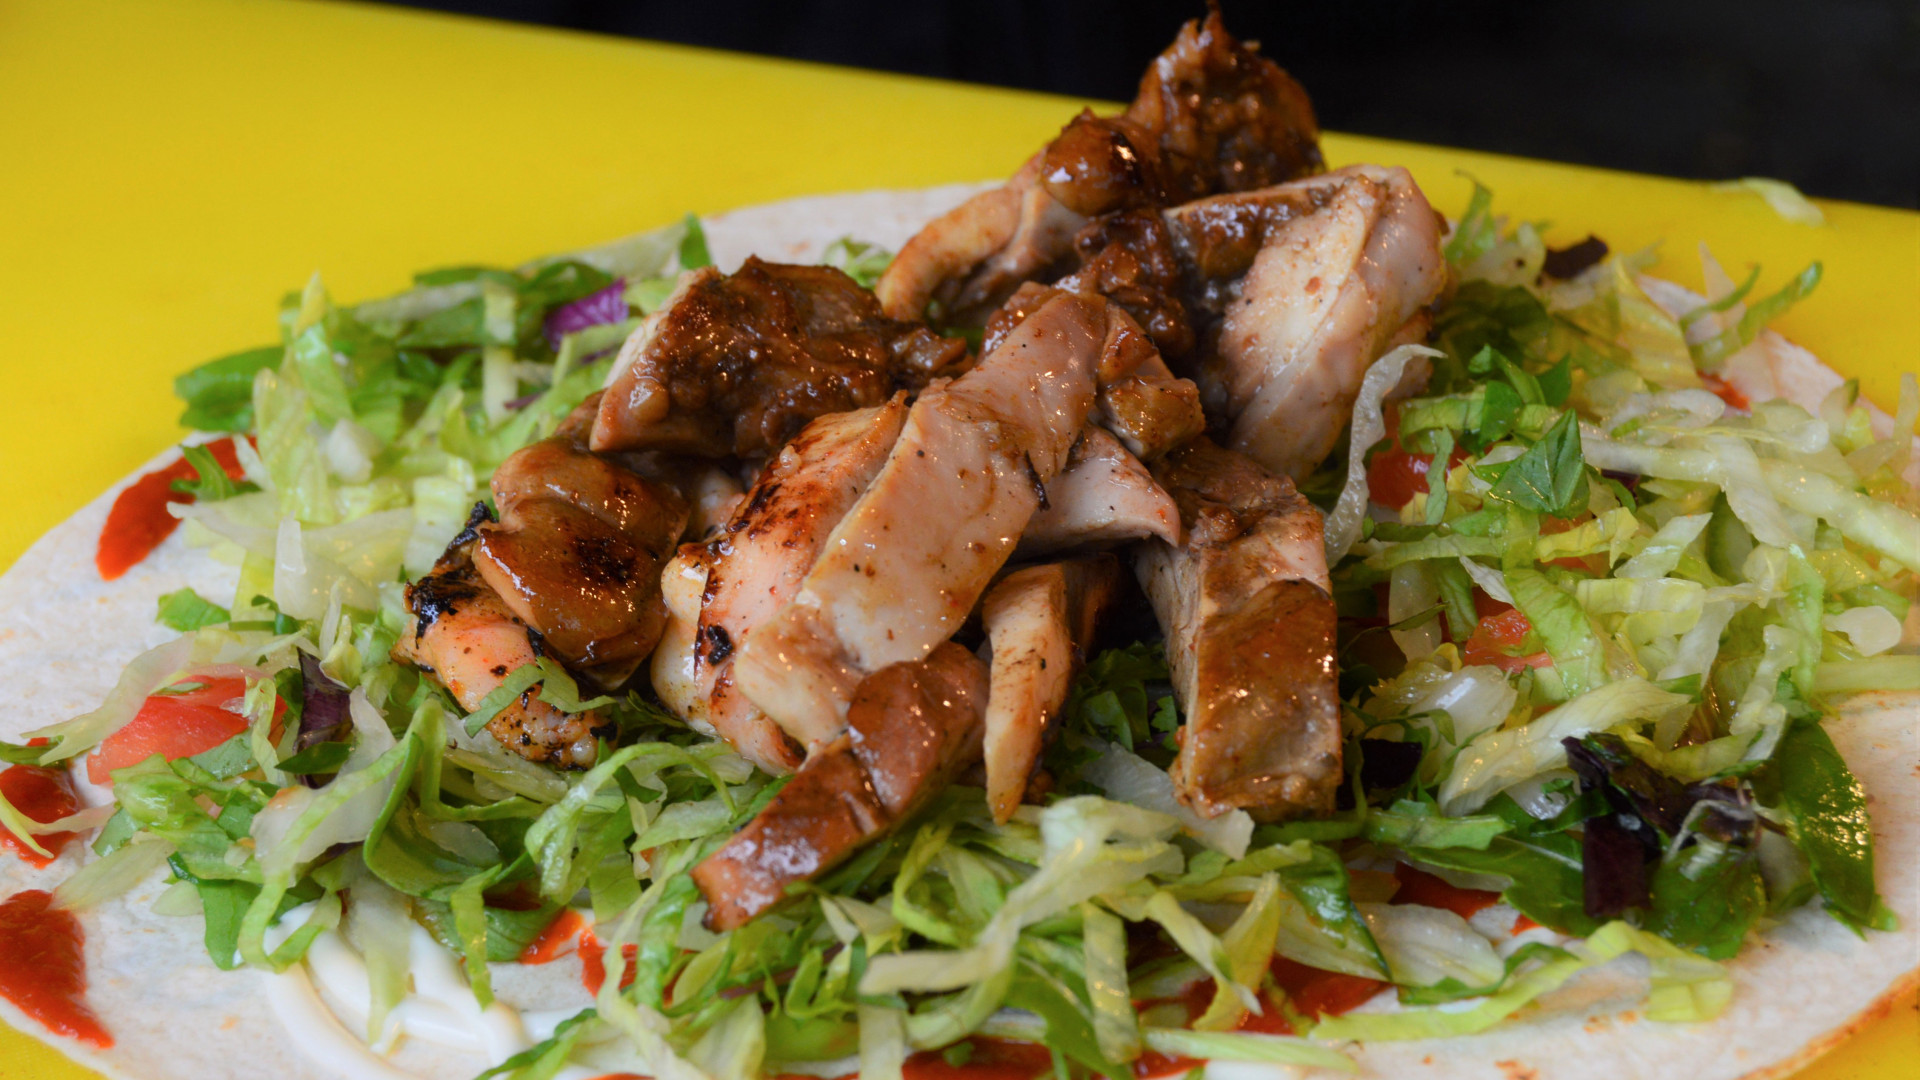 Caribbean restaurants in London - Soul Food